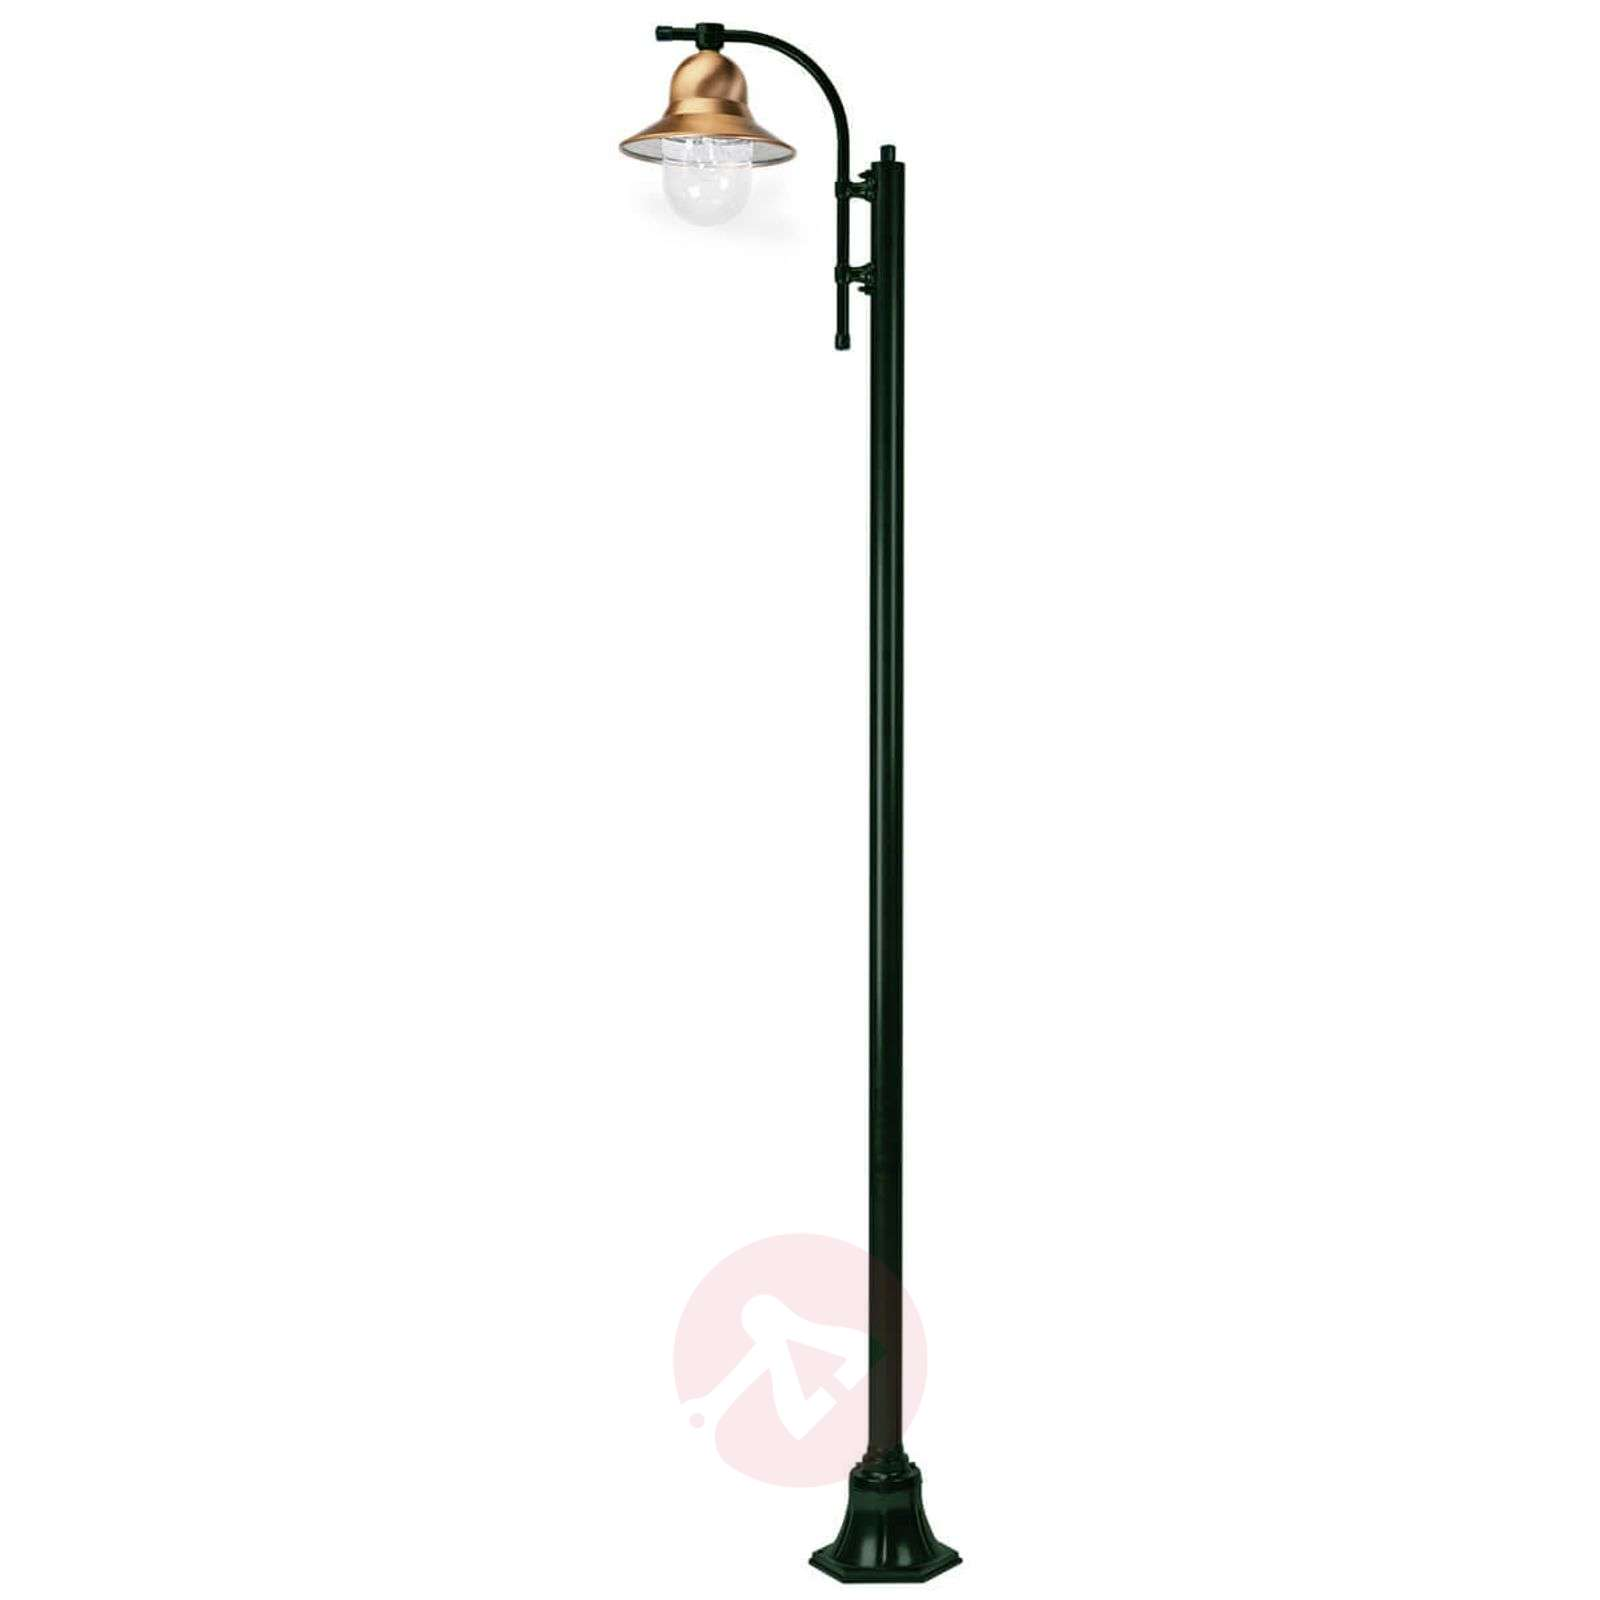 Yksilamppuinen Toscane-lyhtypylväs 240 cm-5515093X-03